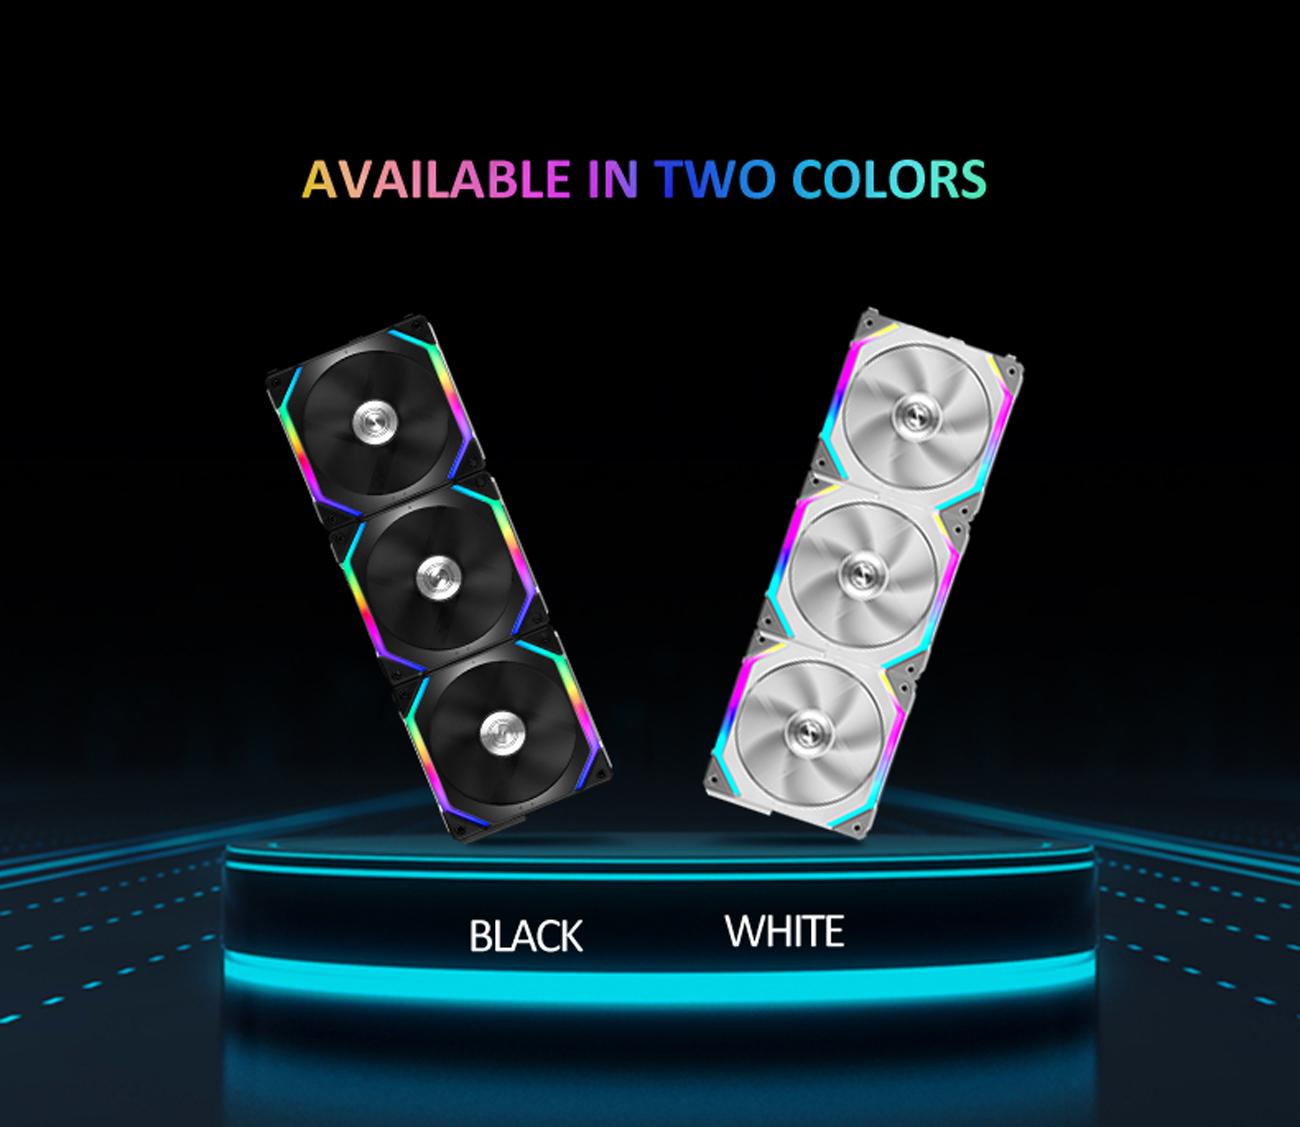 LIAN LI UNI FAN SL120 RGB WHITE 3X 12CM FAN PACK WITH CONTROLLER ---UF-SL120-3W  - Newegg.com